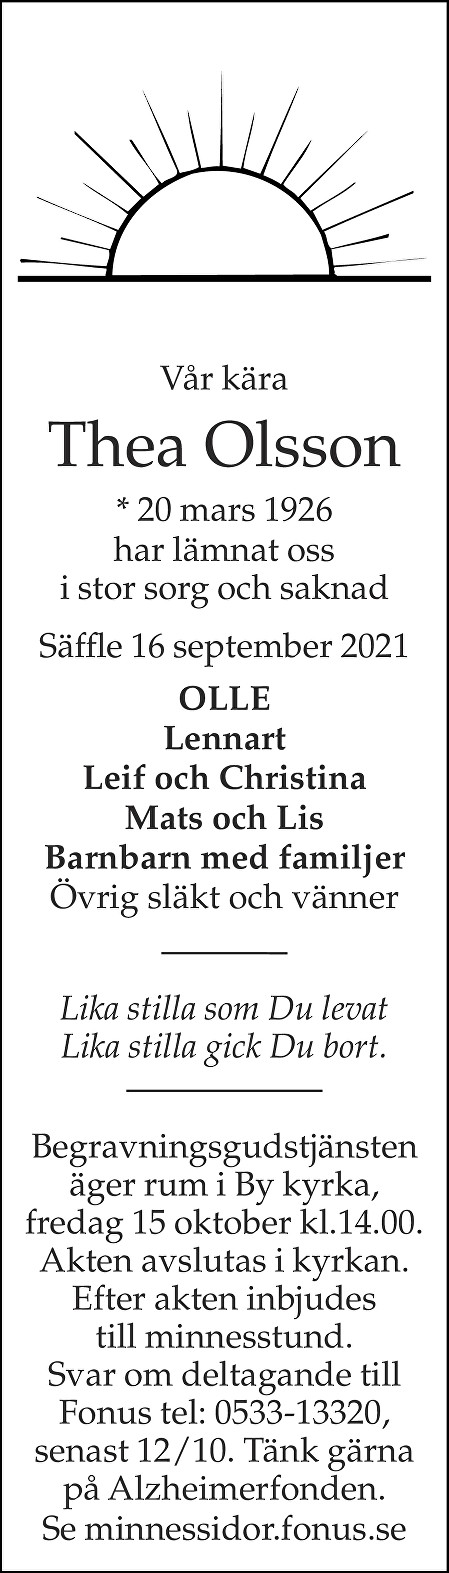 Thea Olsson Death notice